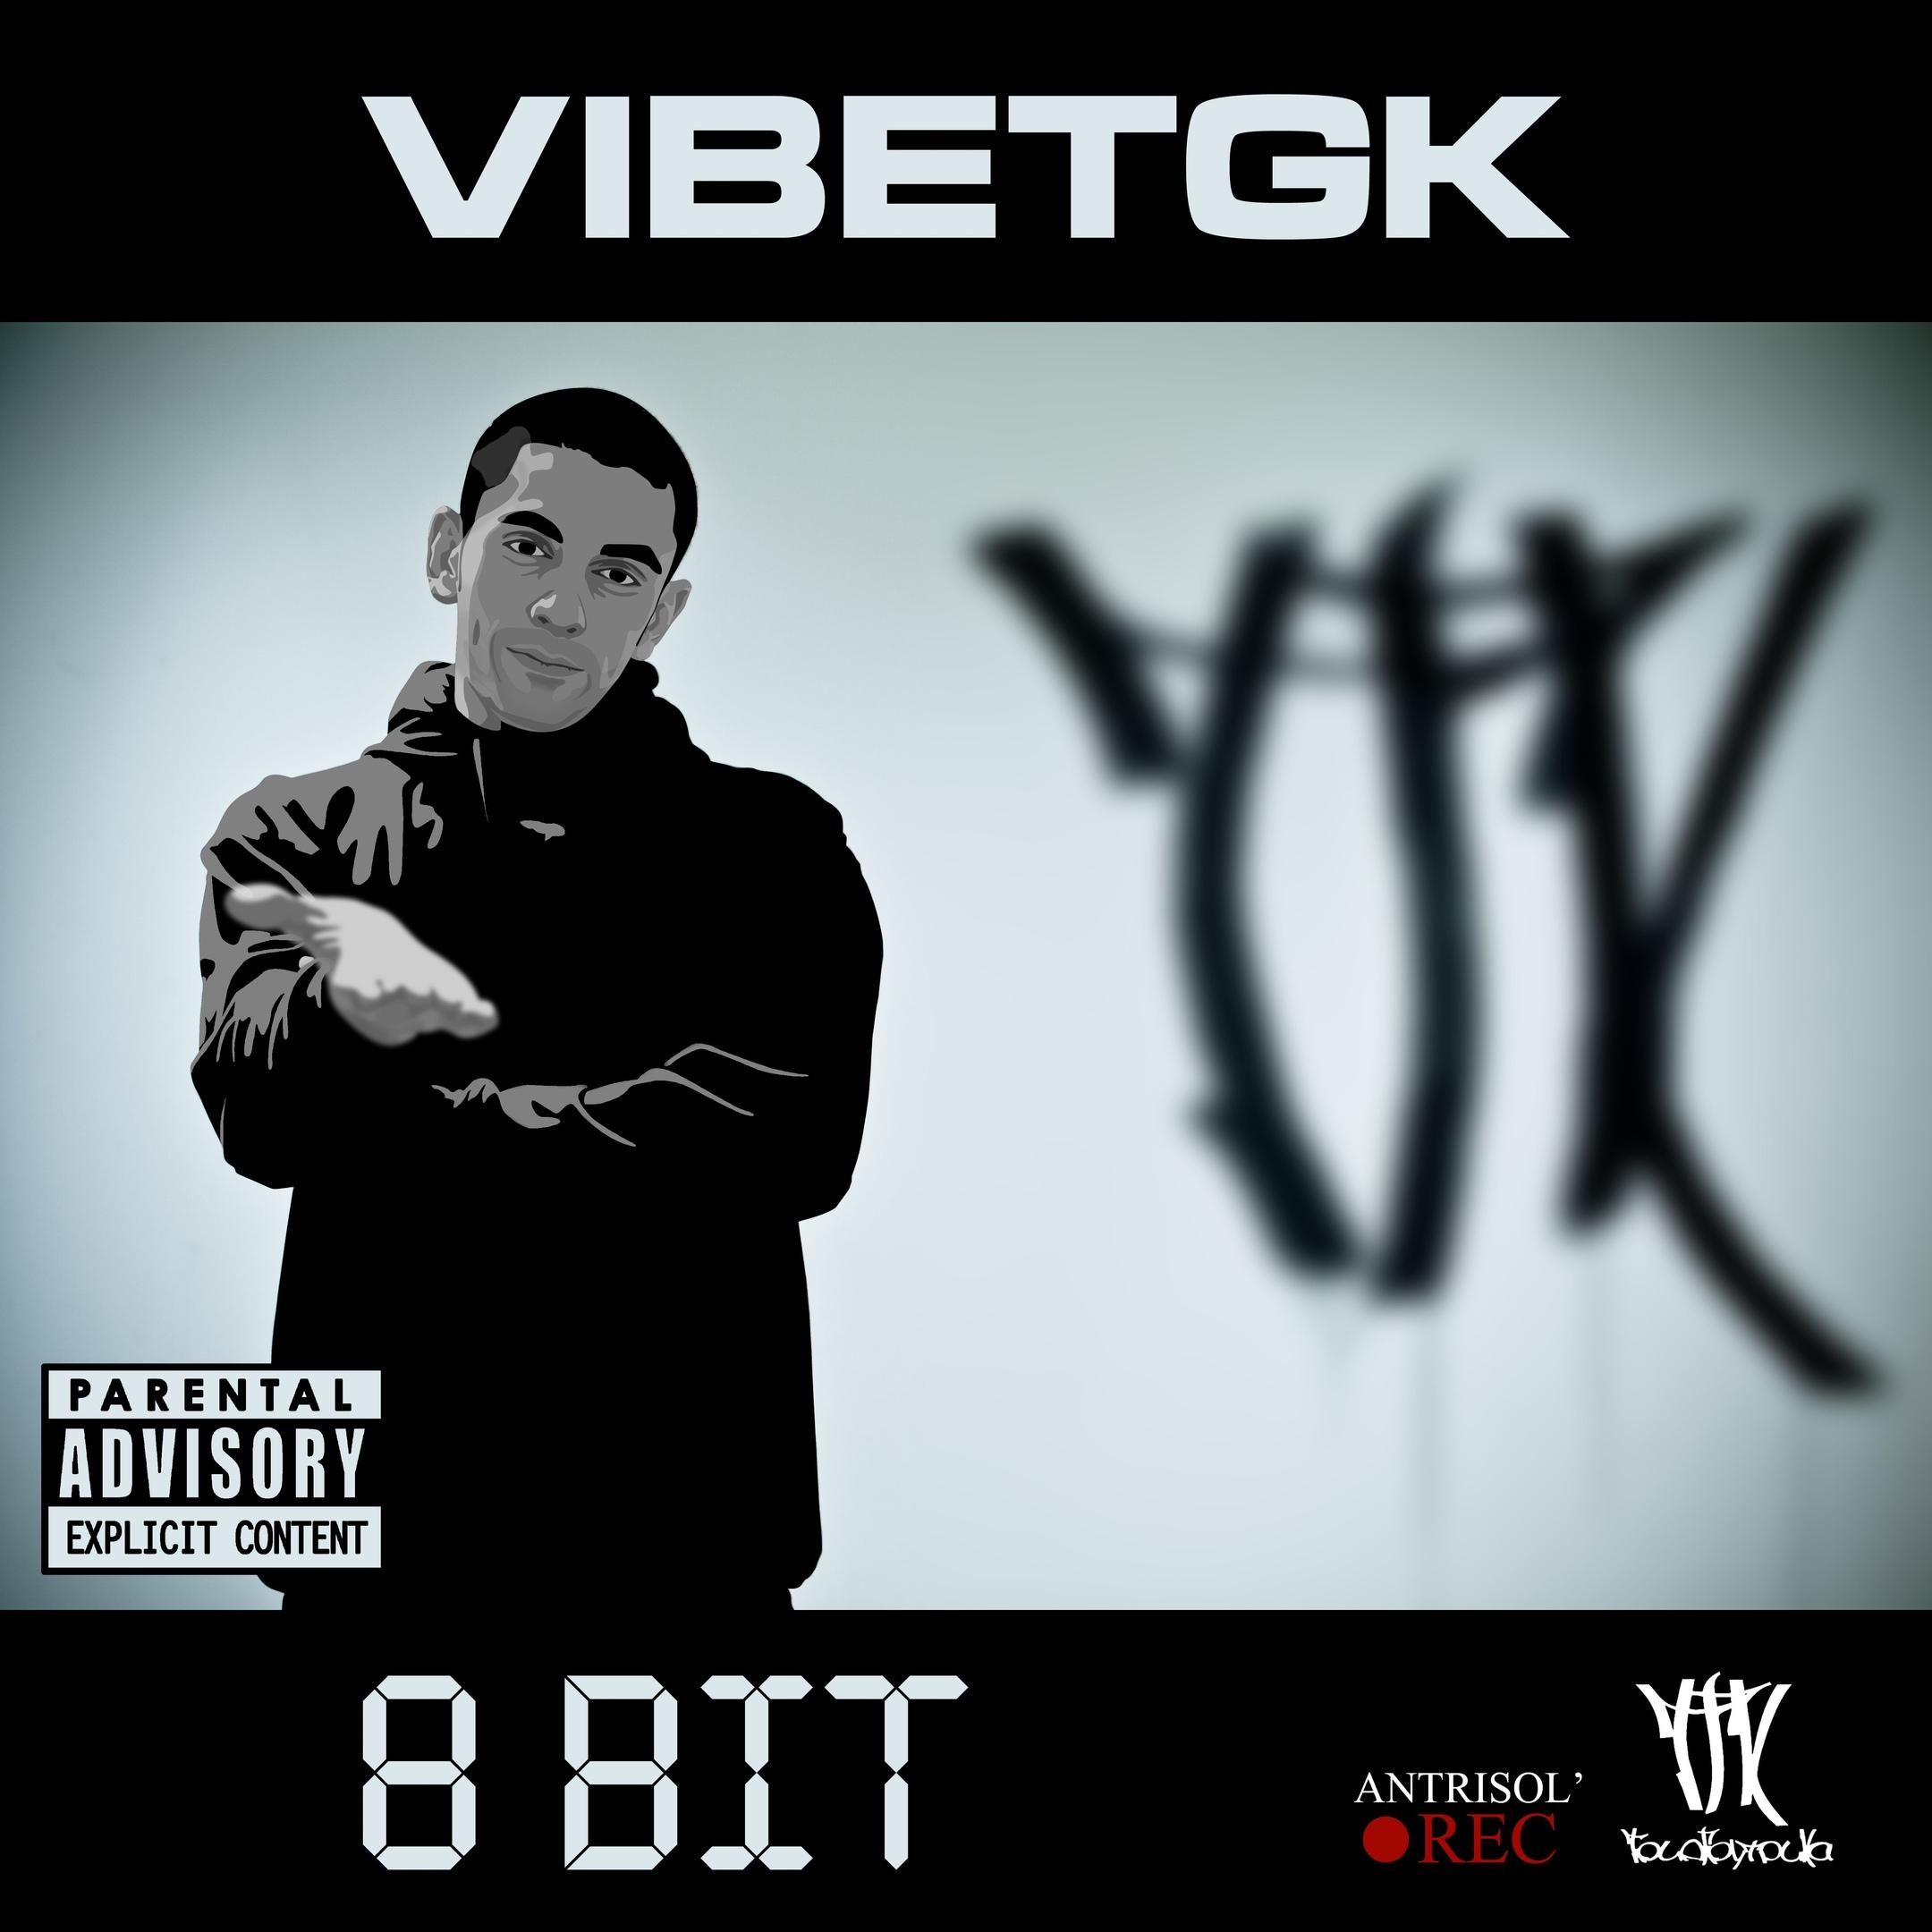 VibeTGK album 8 Bit